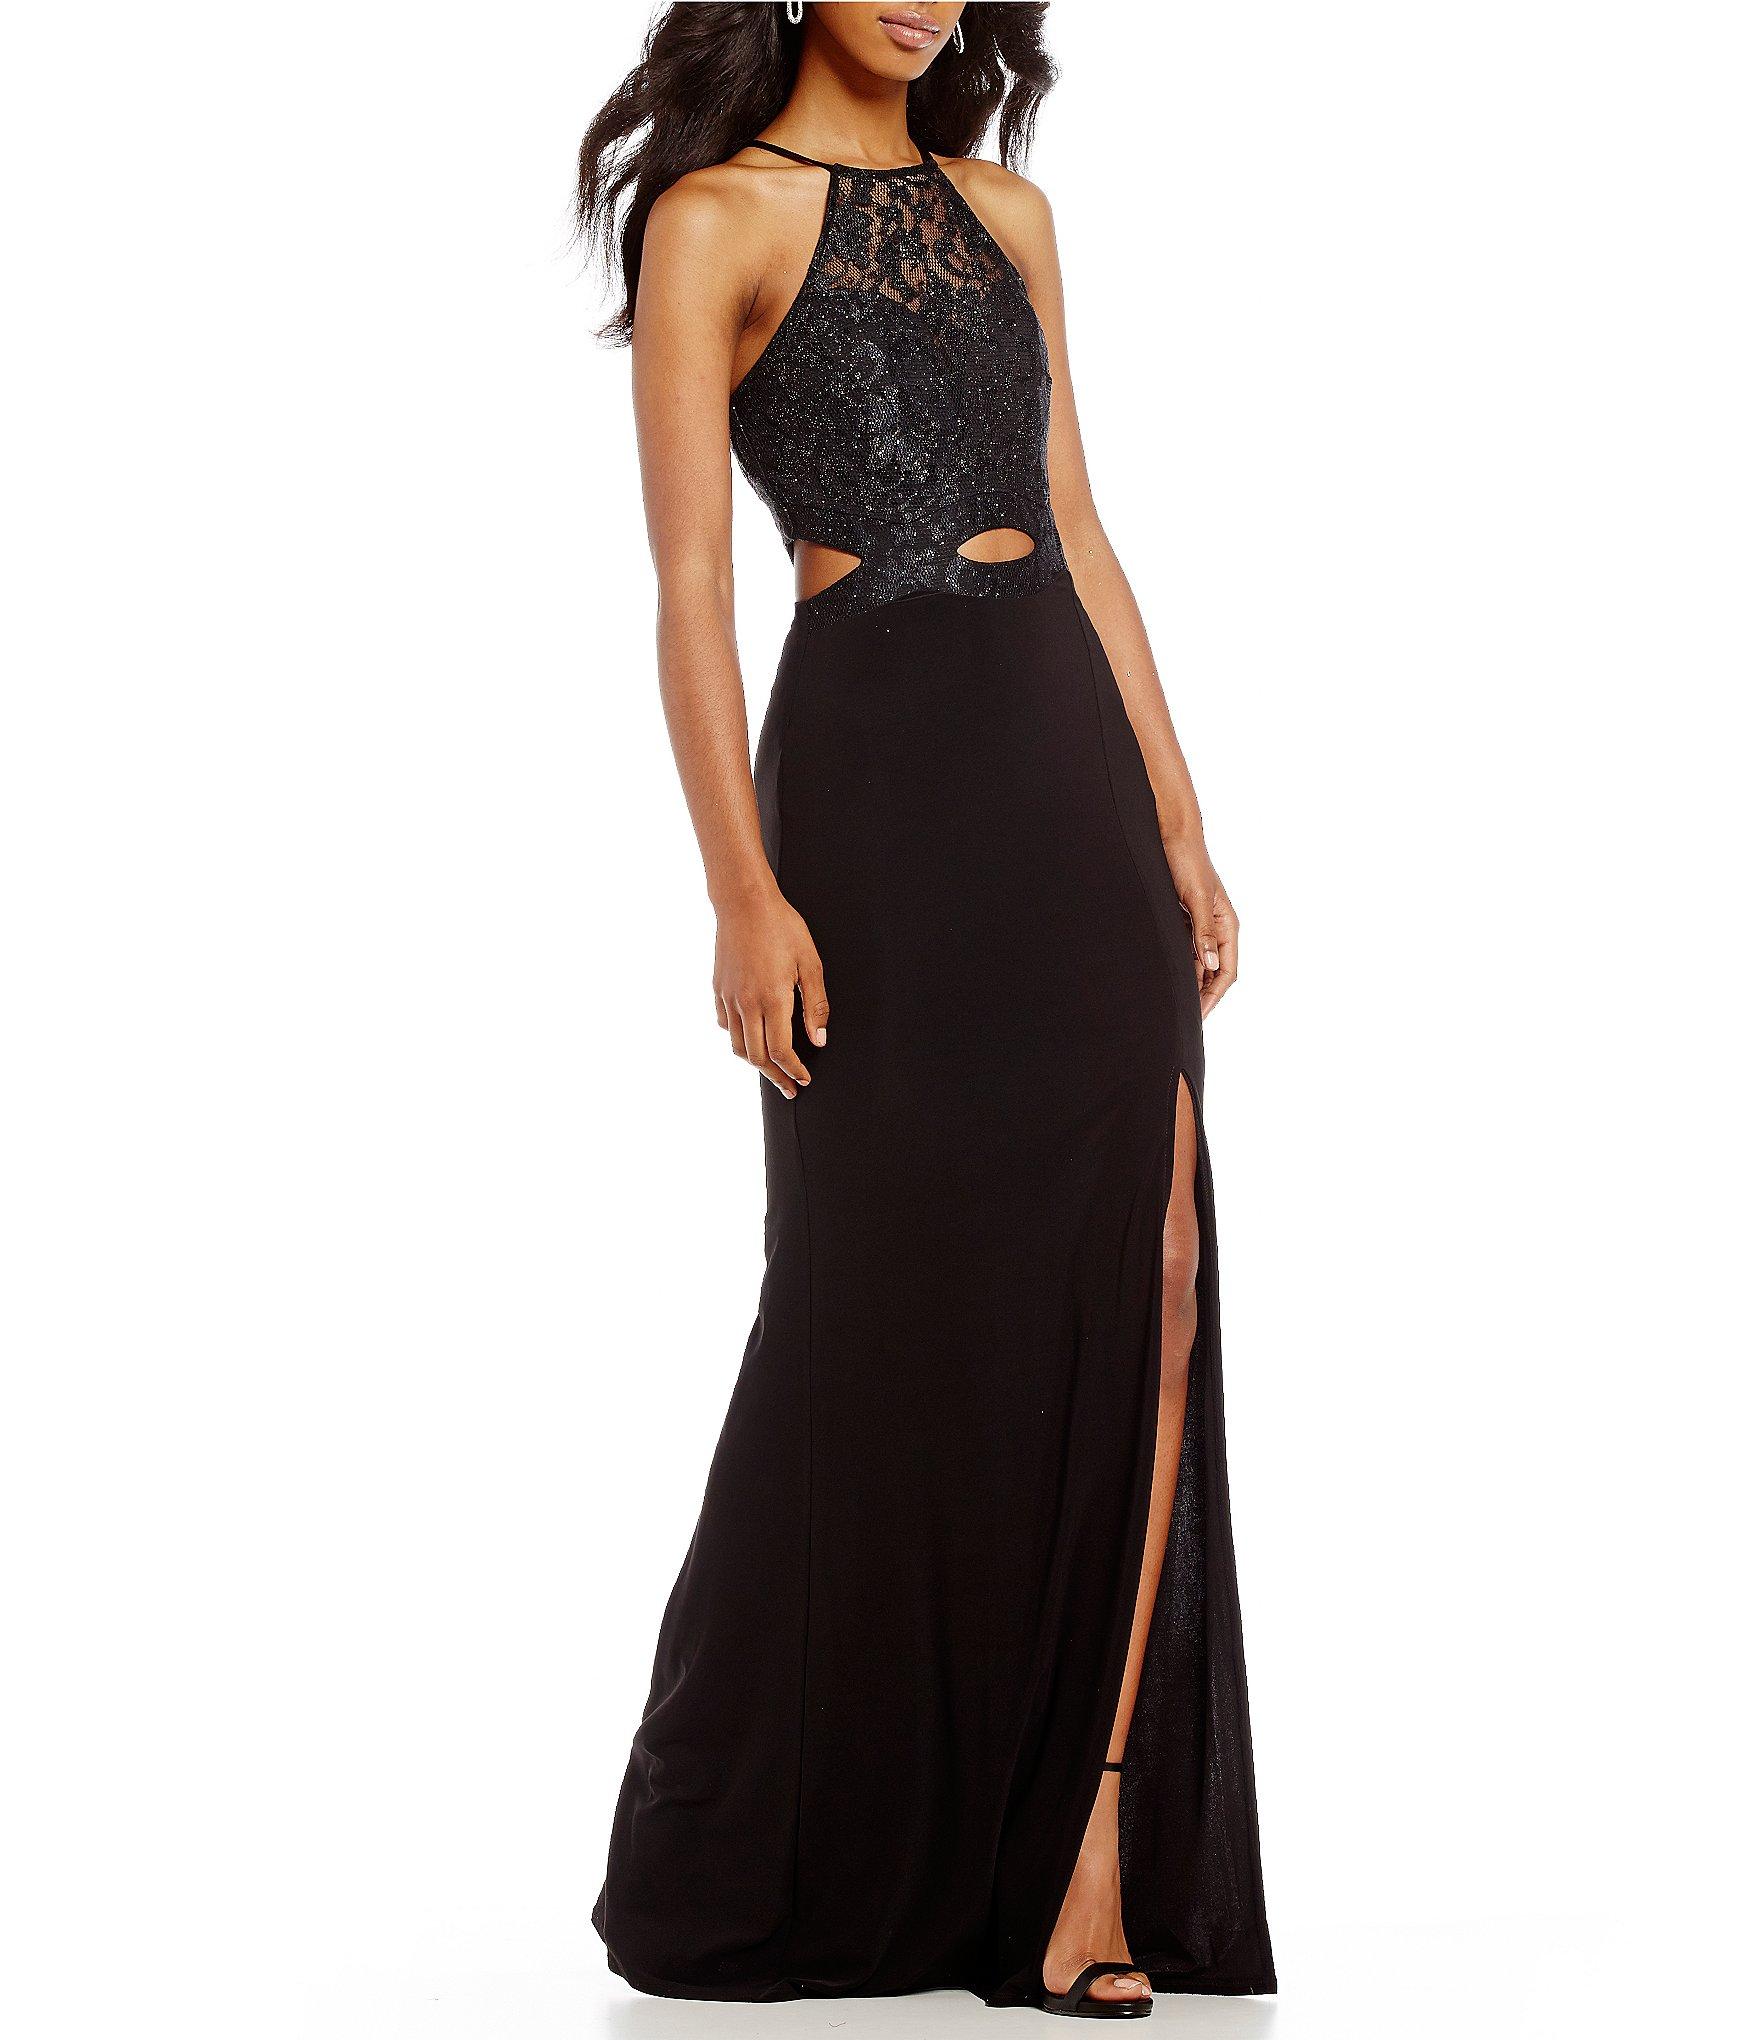 Arden b long dresses 6t